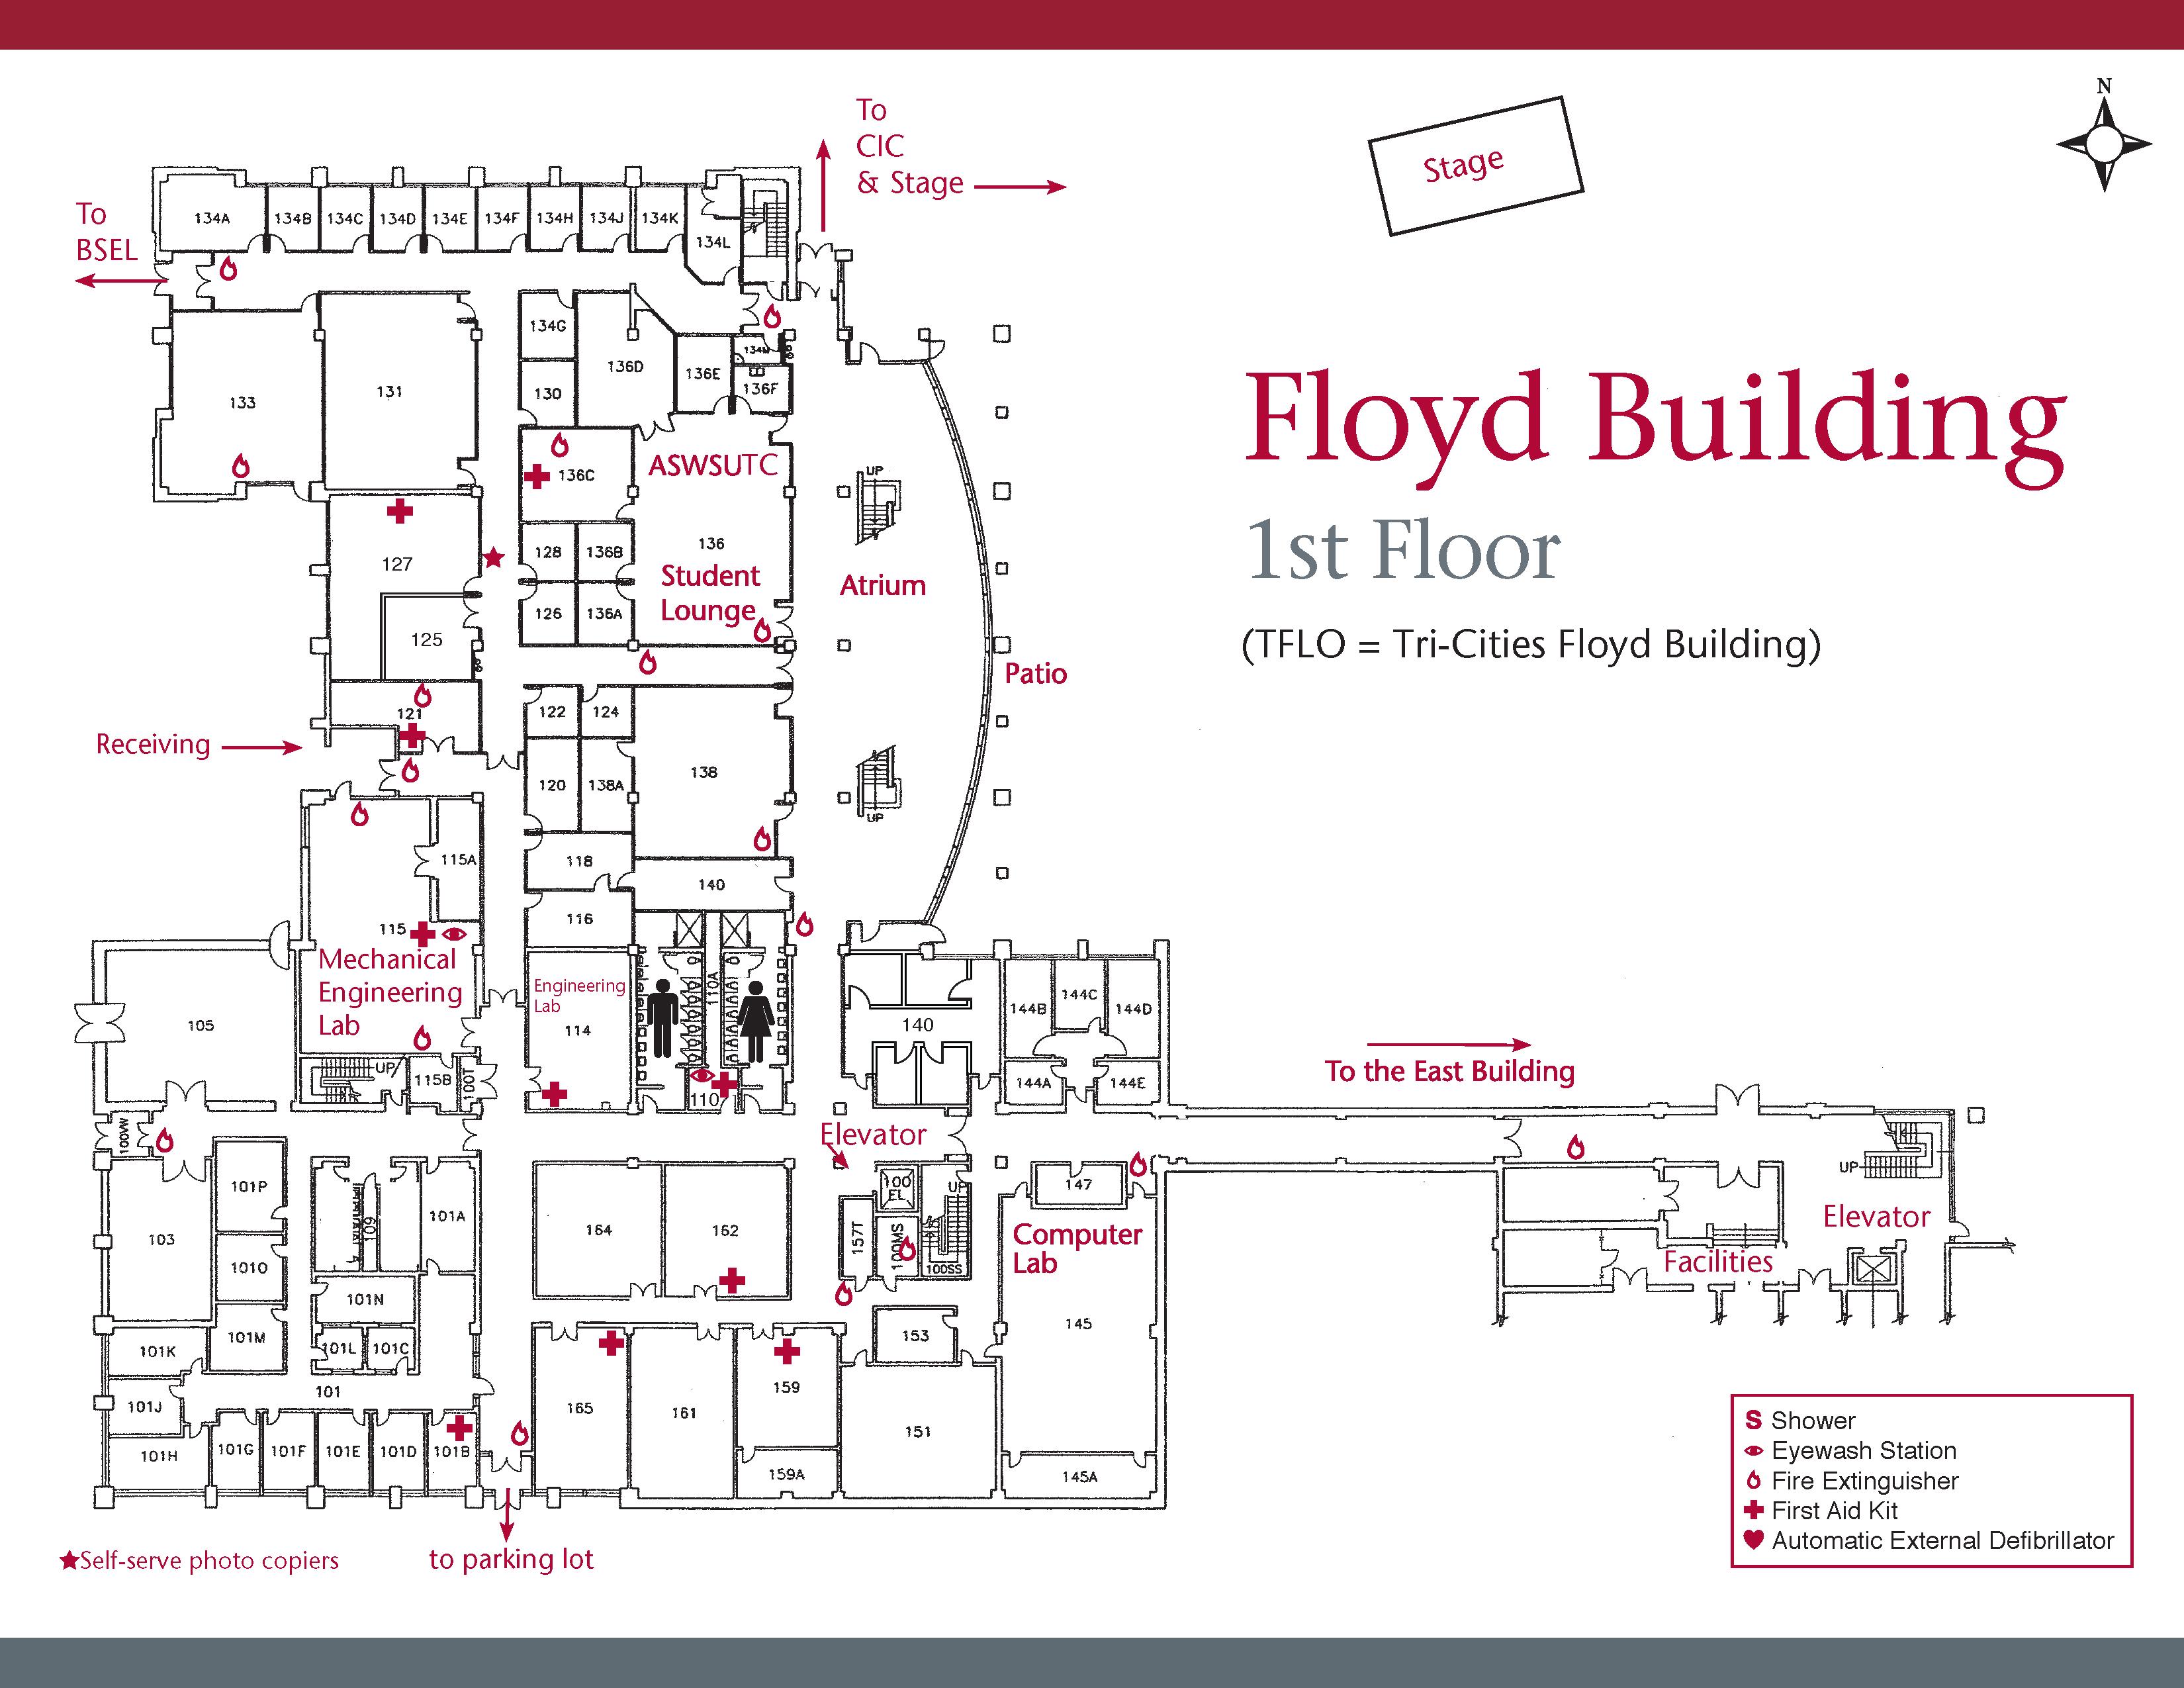 Floyd Building campus map 1st floor